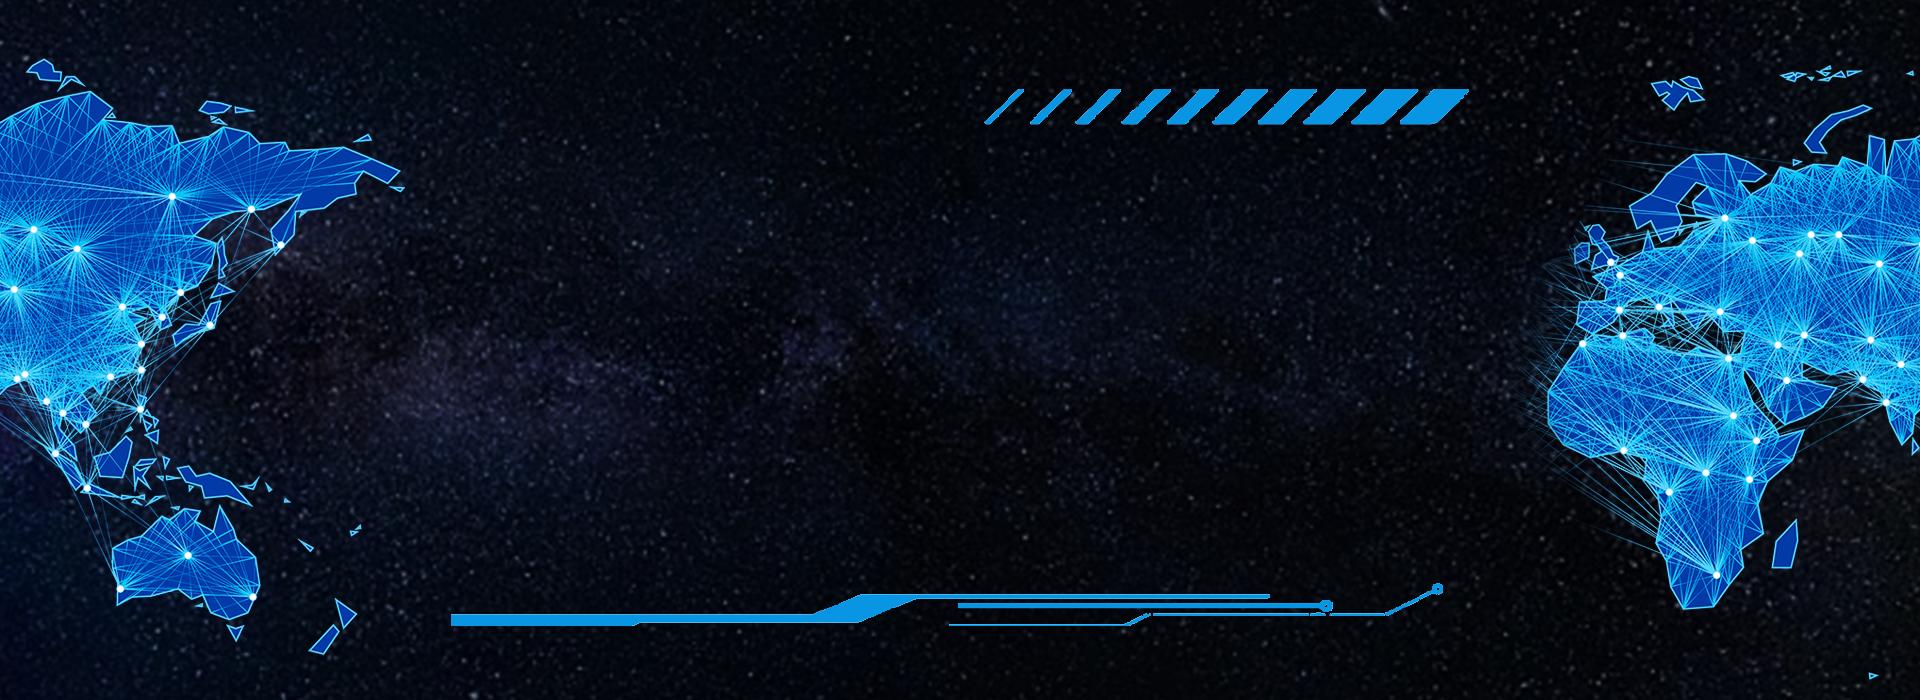 Download 9400 Background Blue Tech Gratis Terbaru